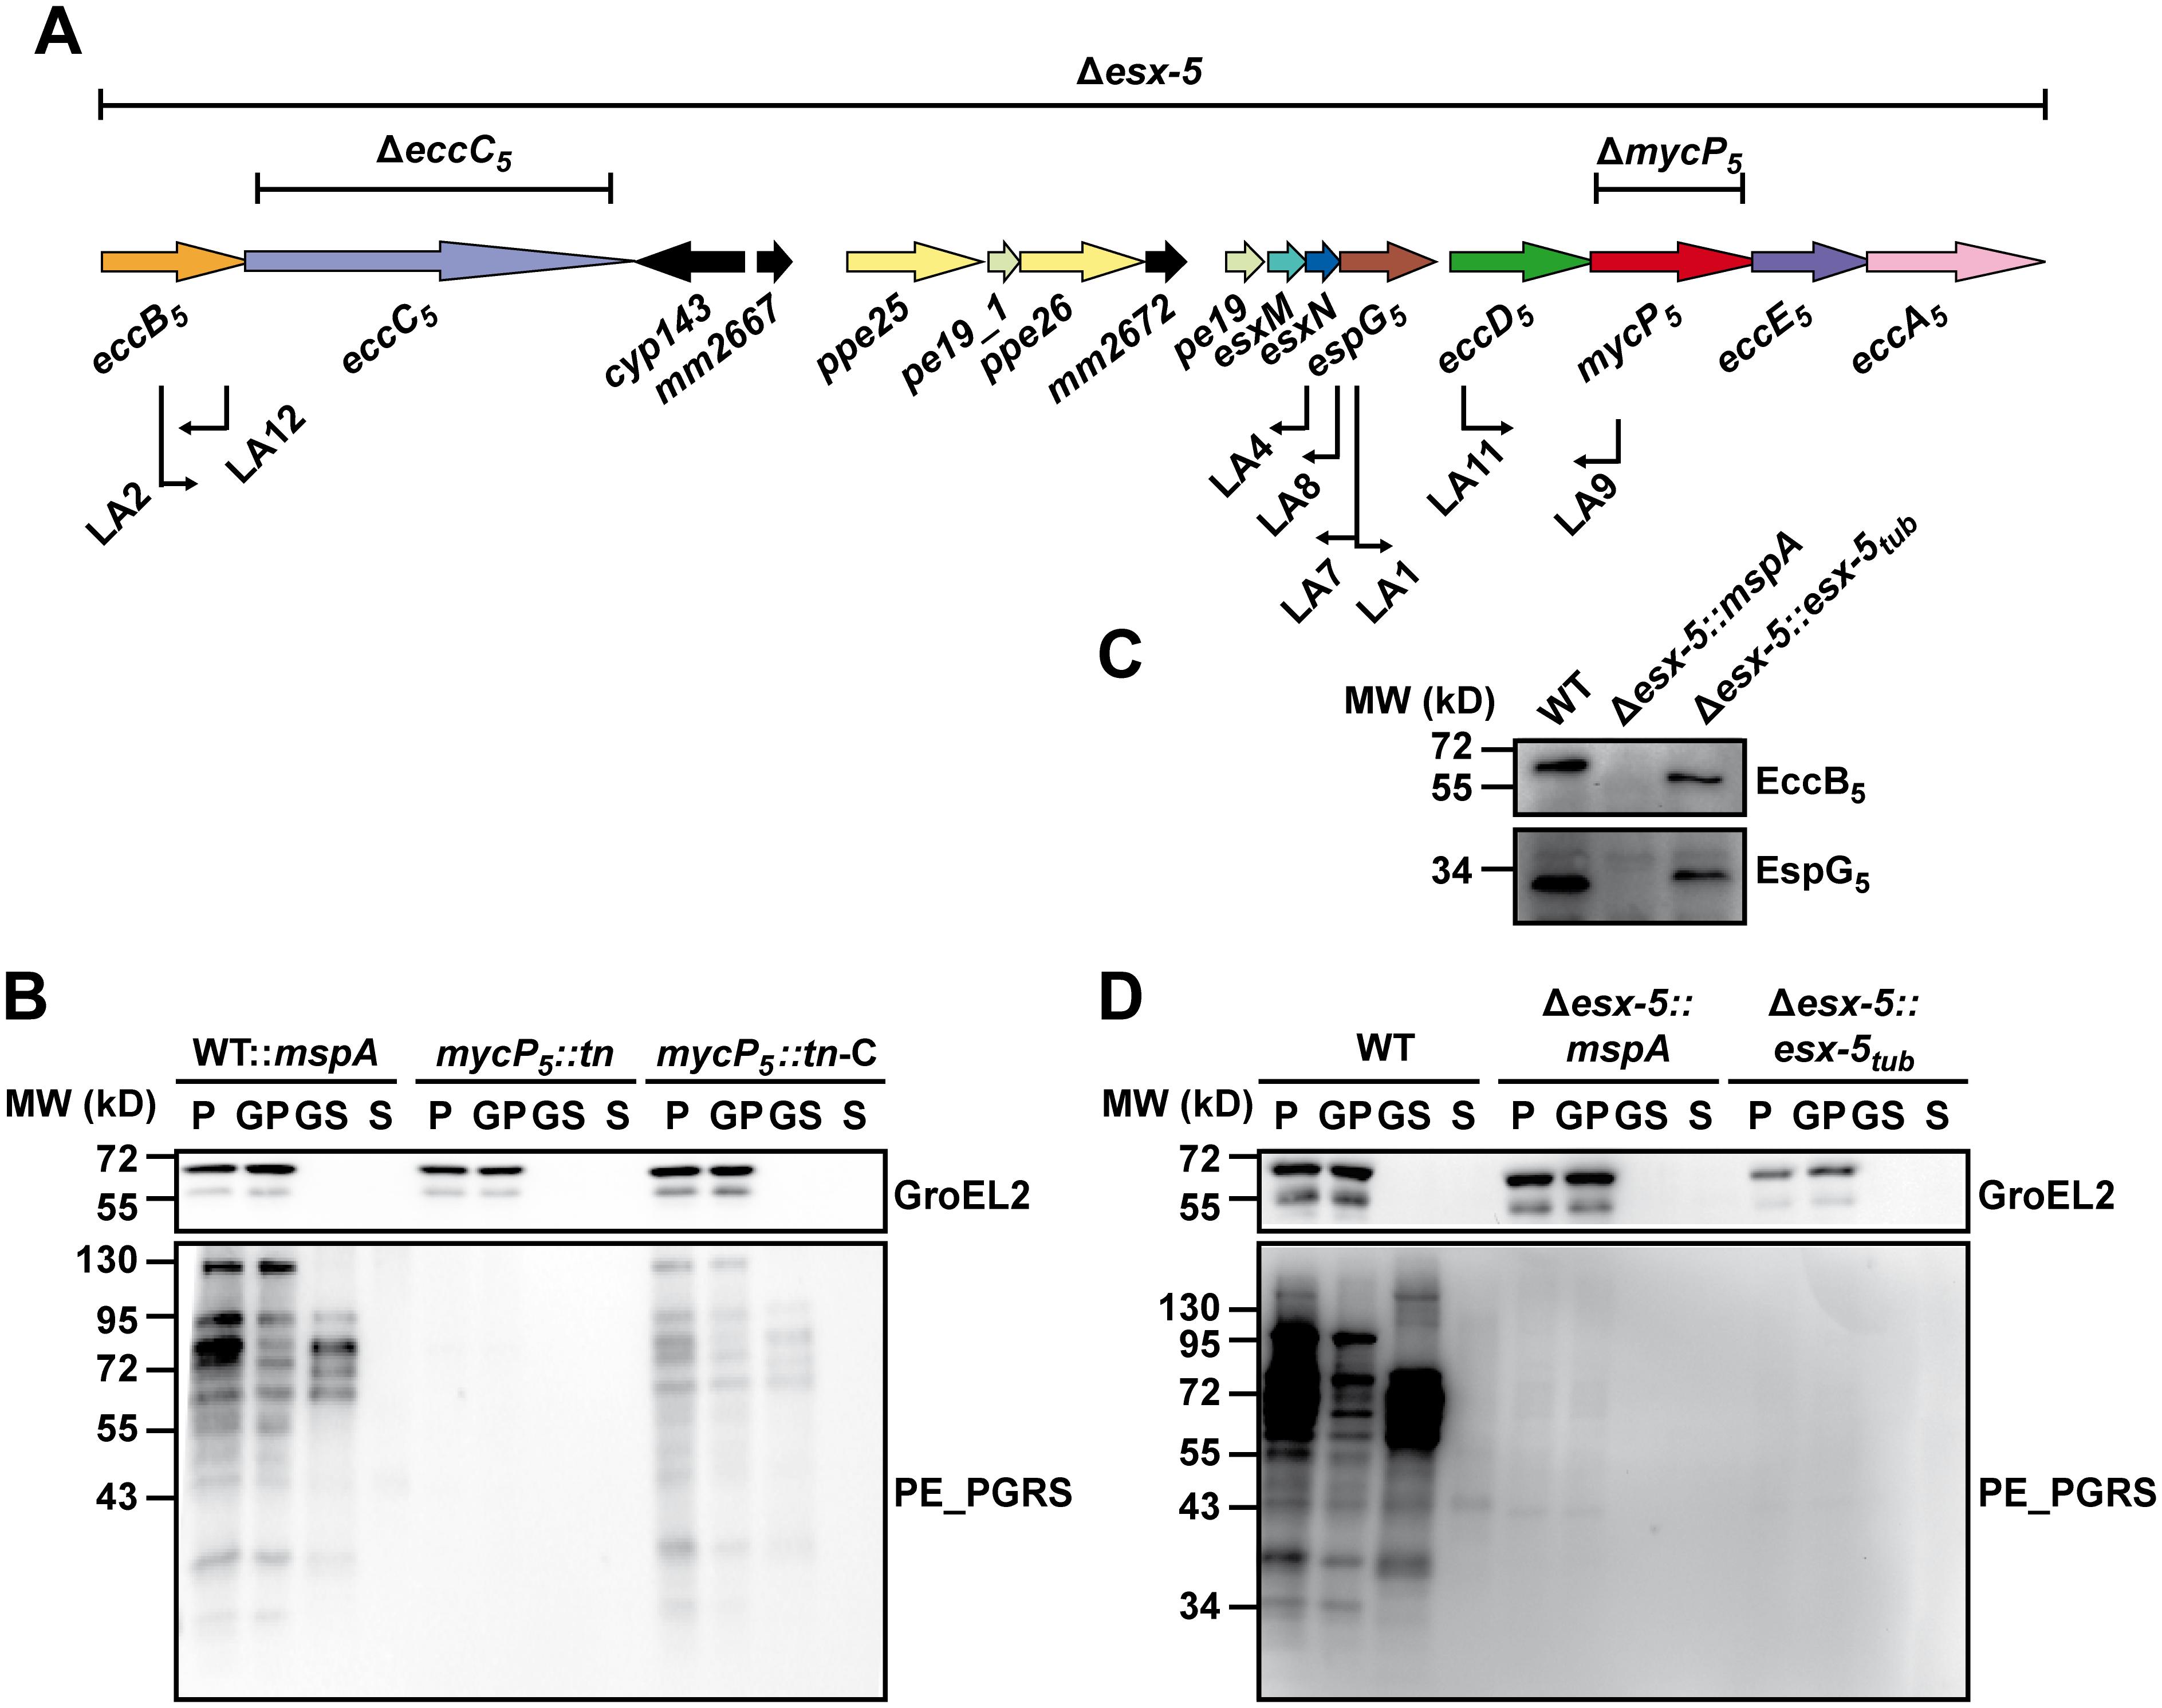 Secretion analysis of ESX-5 mutant strains.